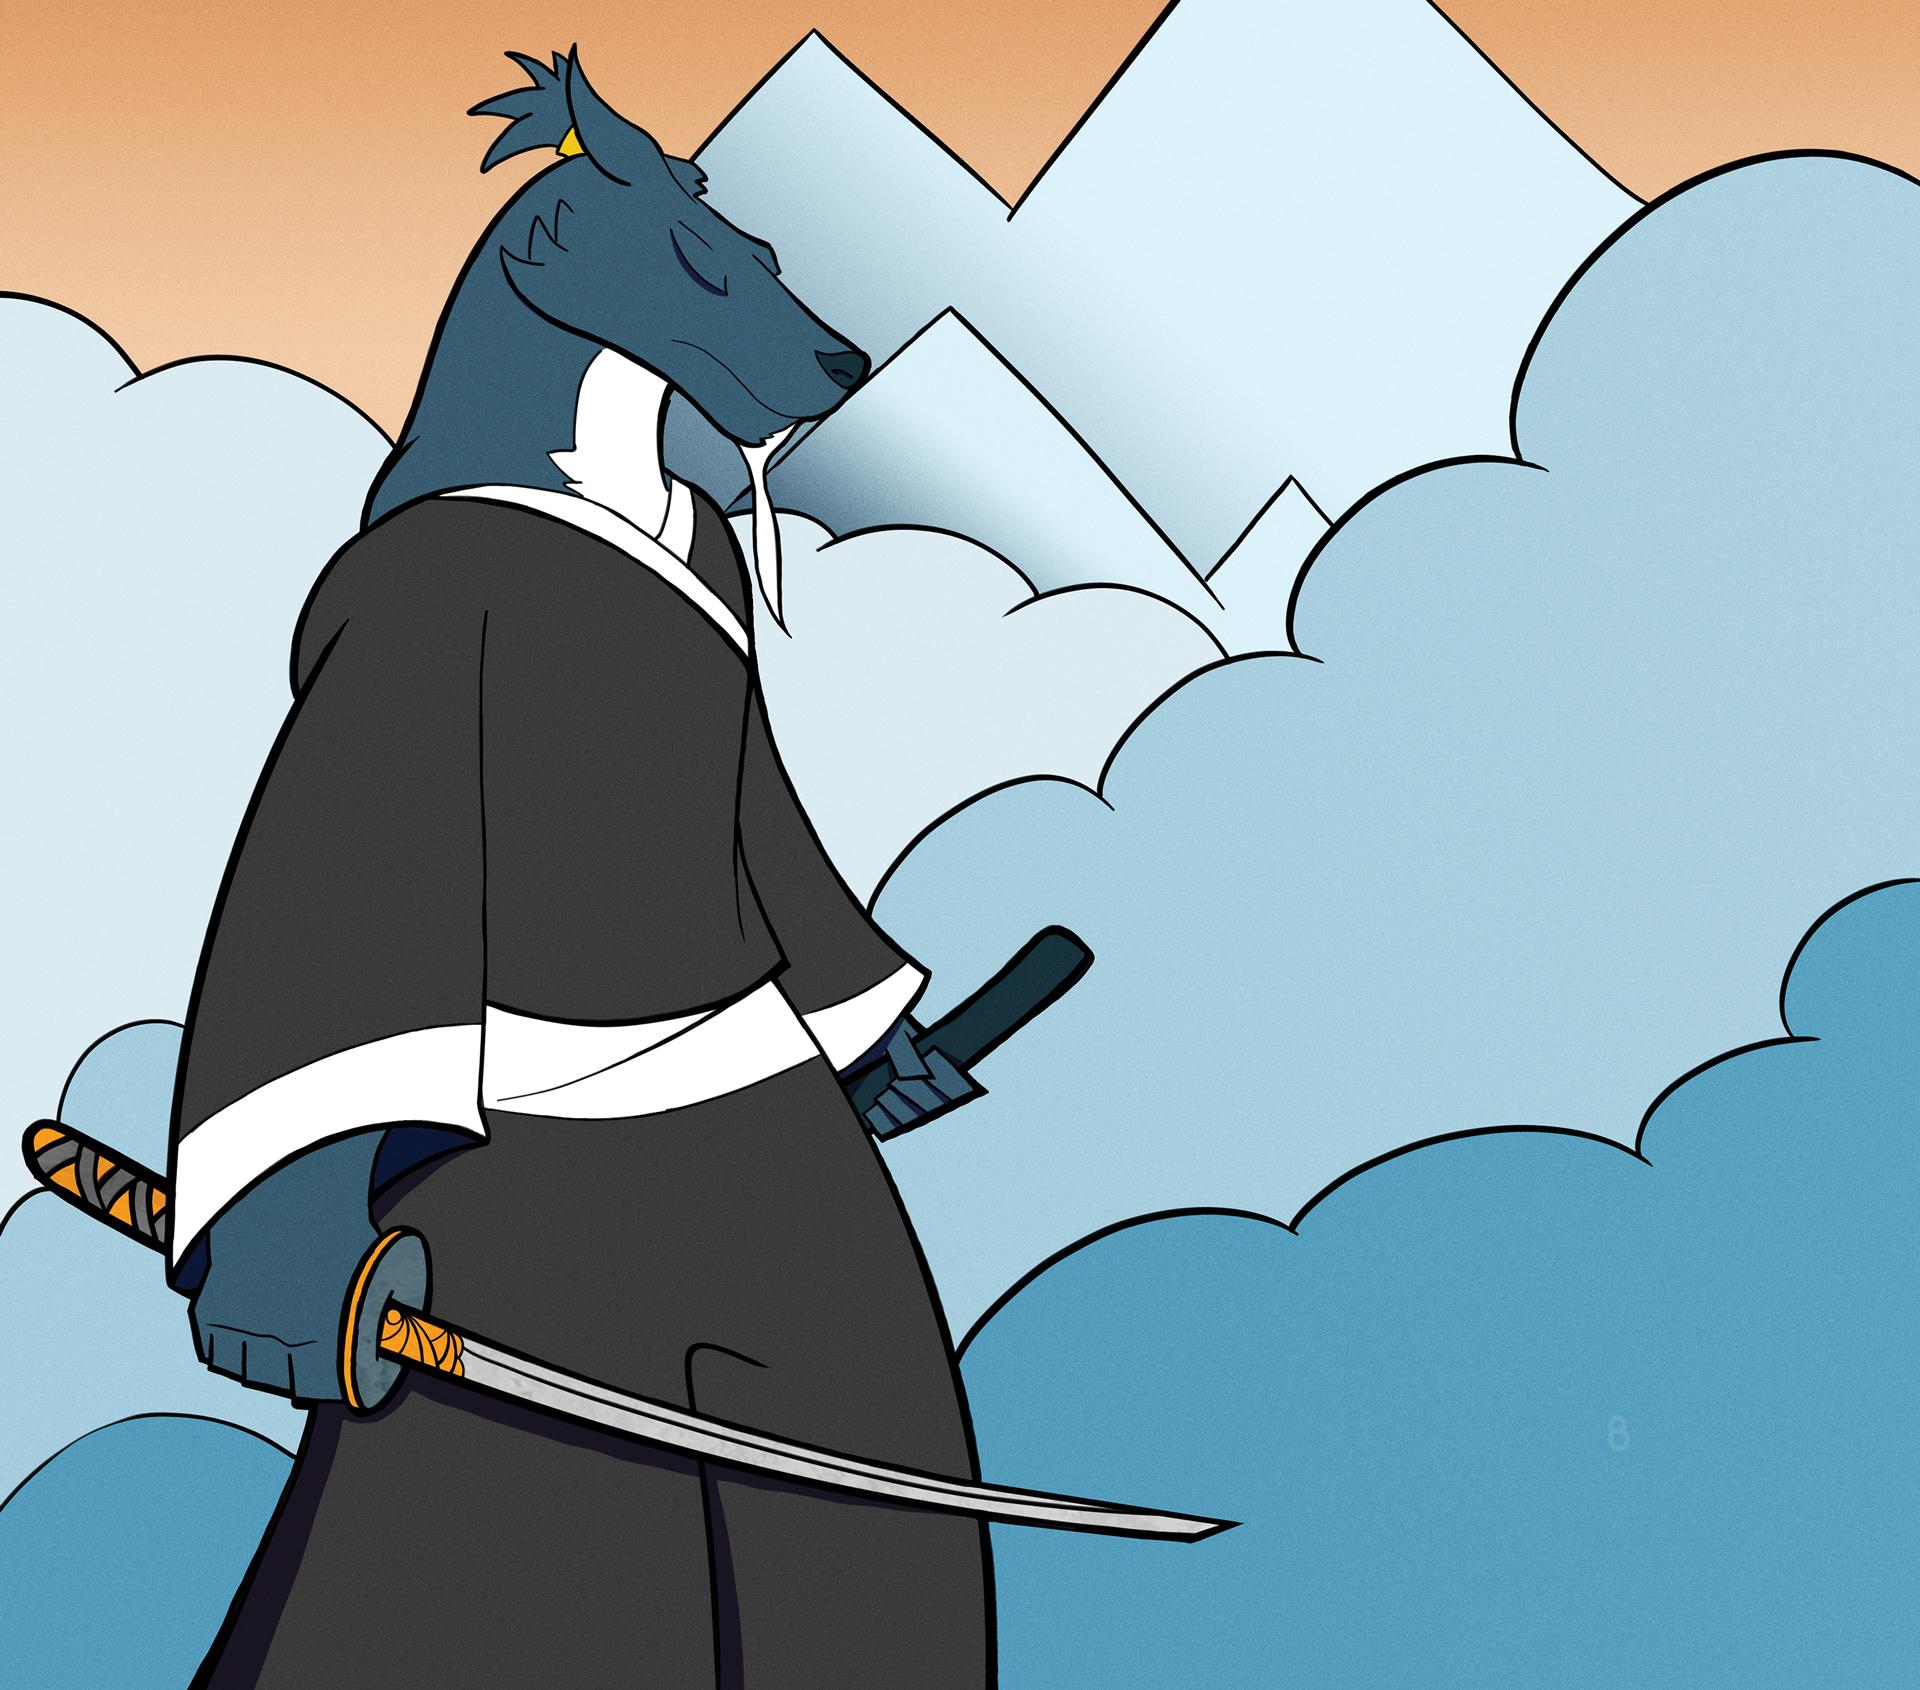 samurai-wolf-illustration-10.jpg